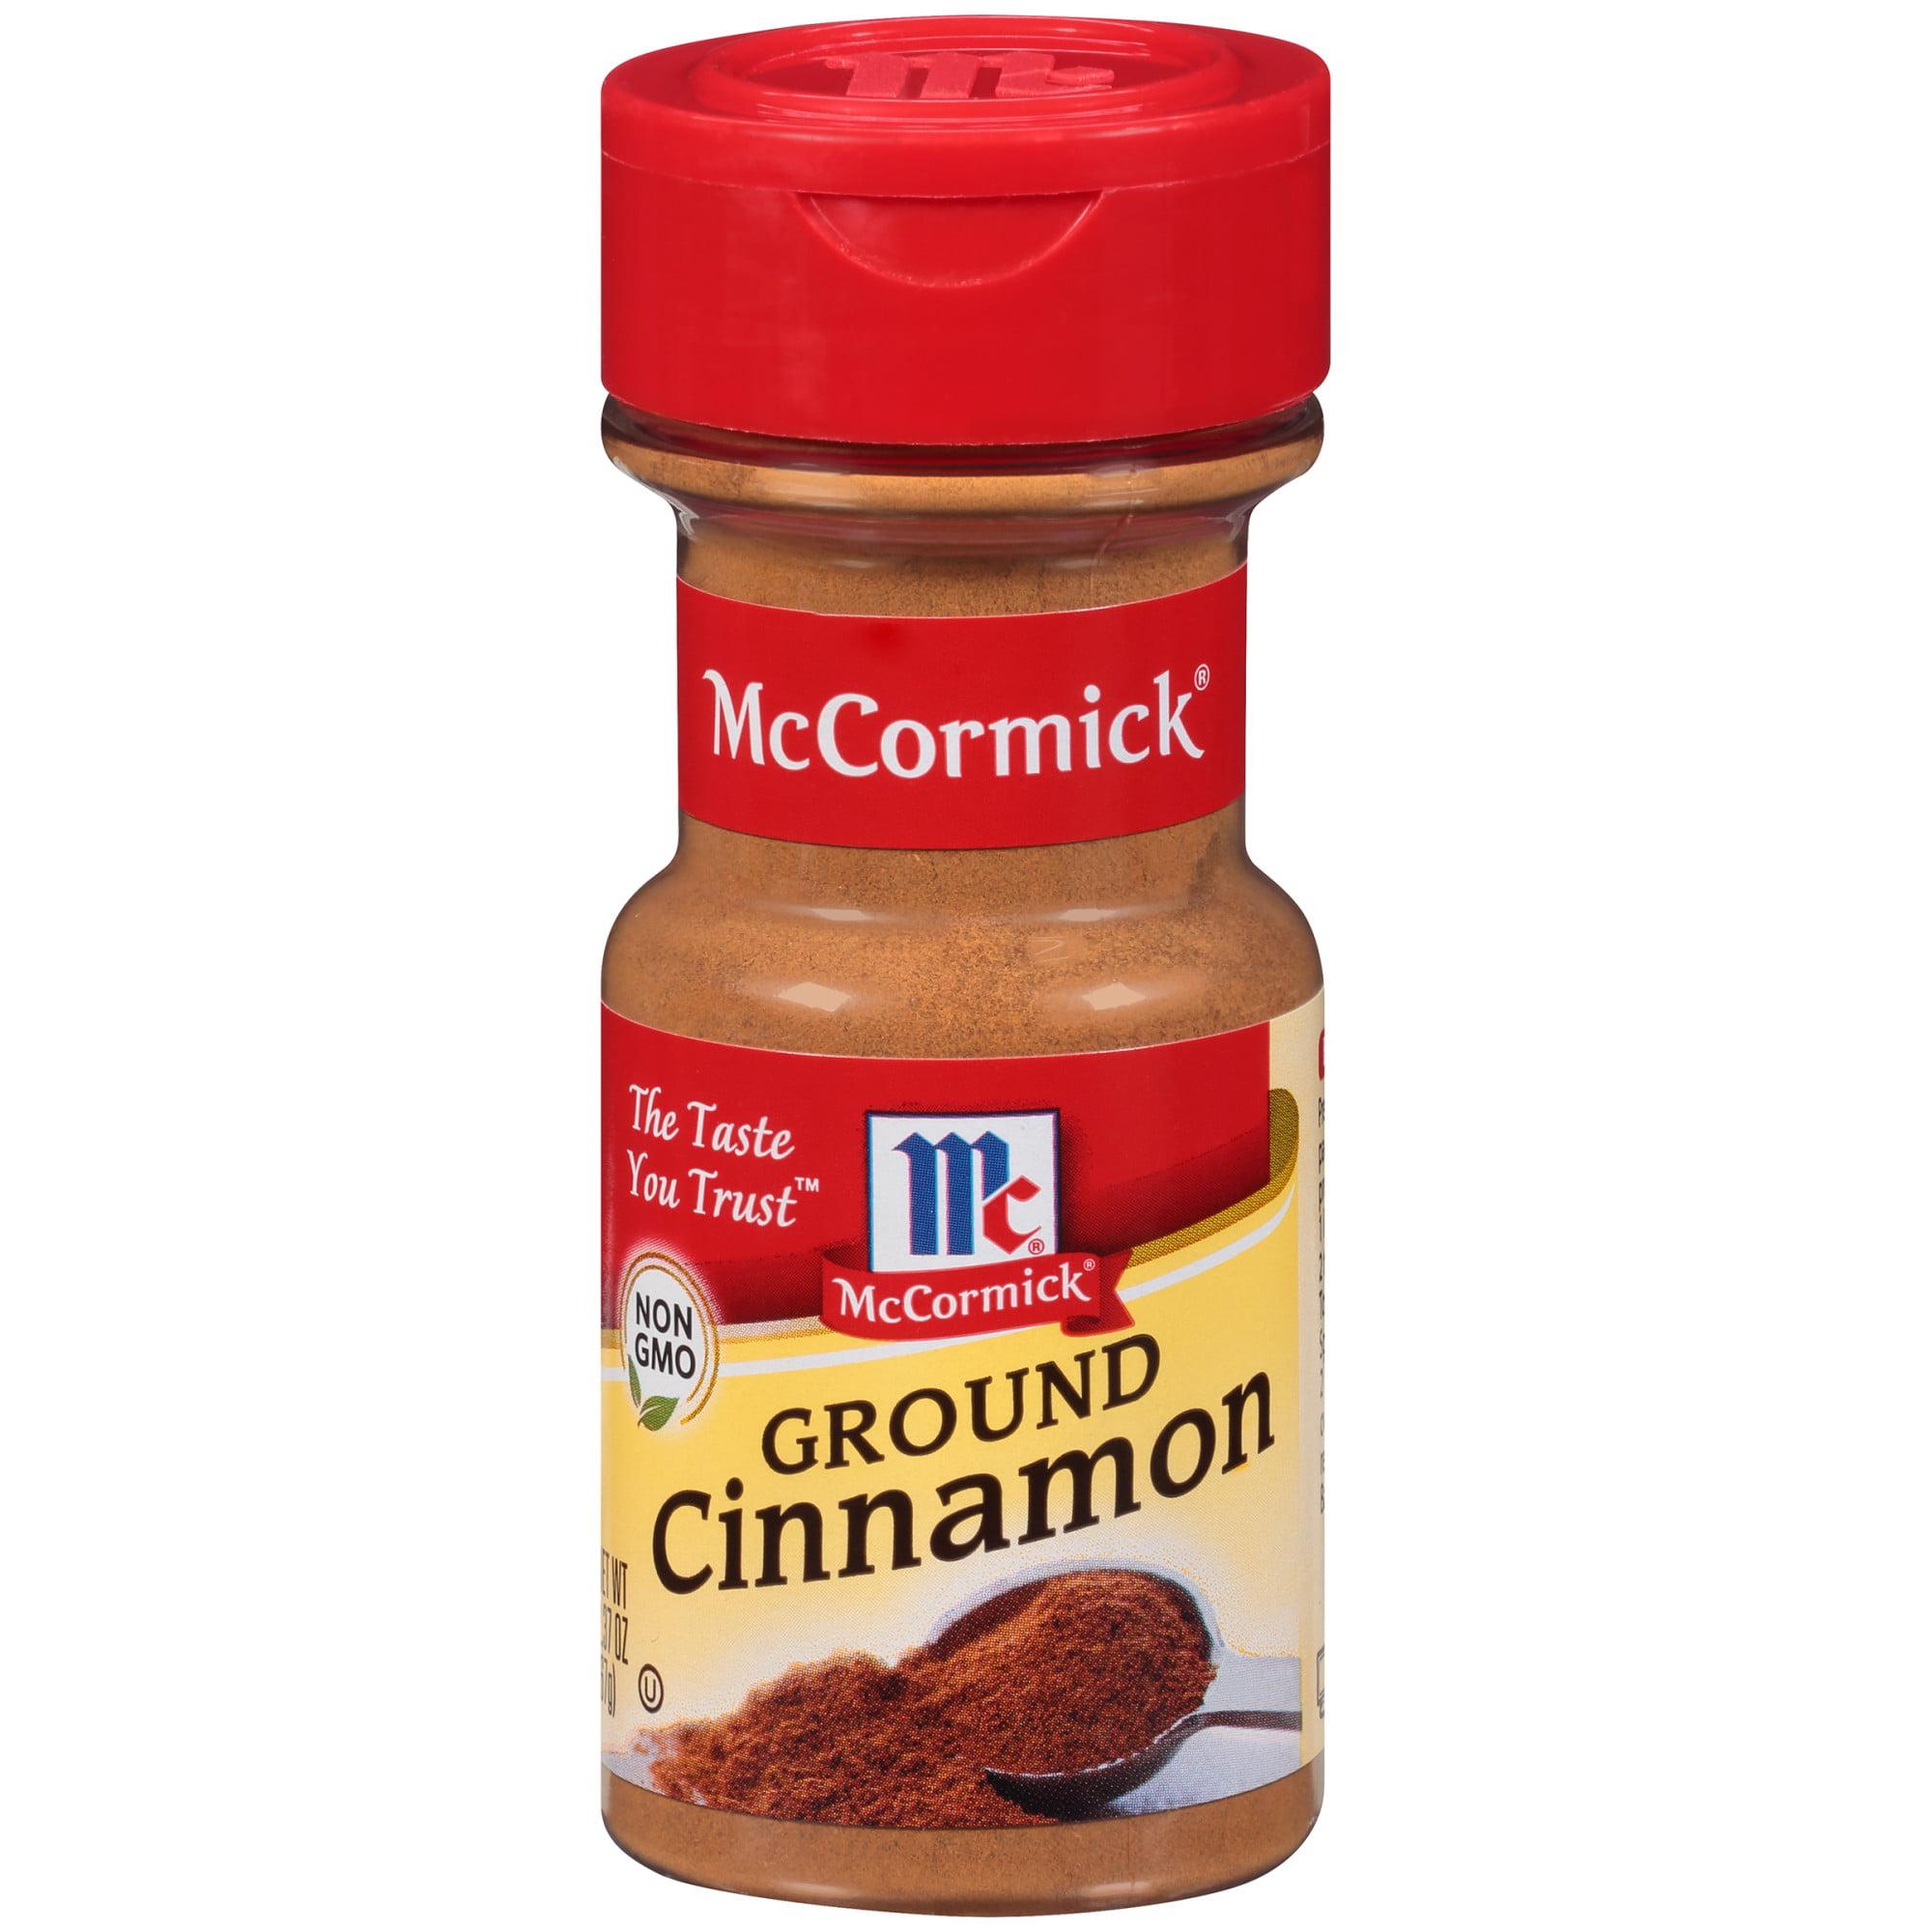 (2 Pack) McCormick Ground Cinnamon, 2.37 oz